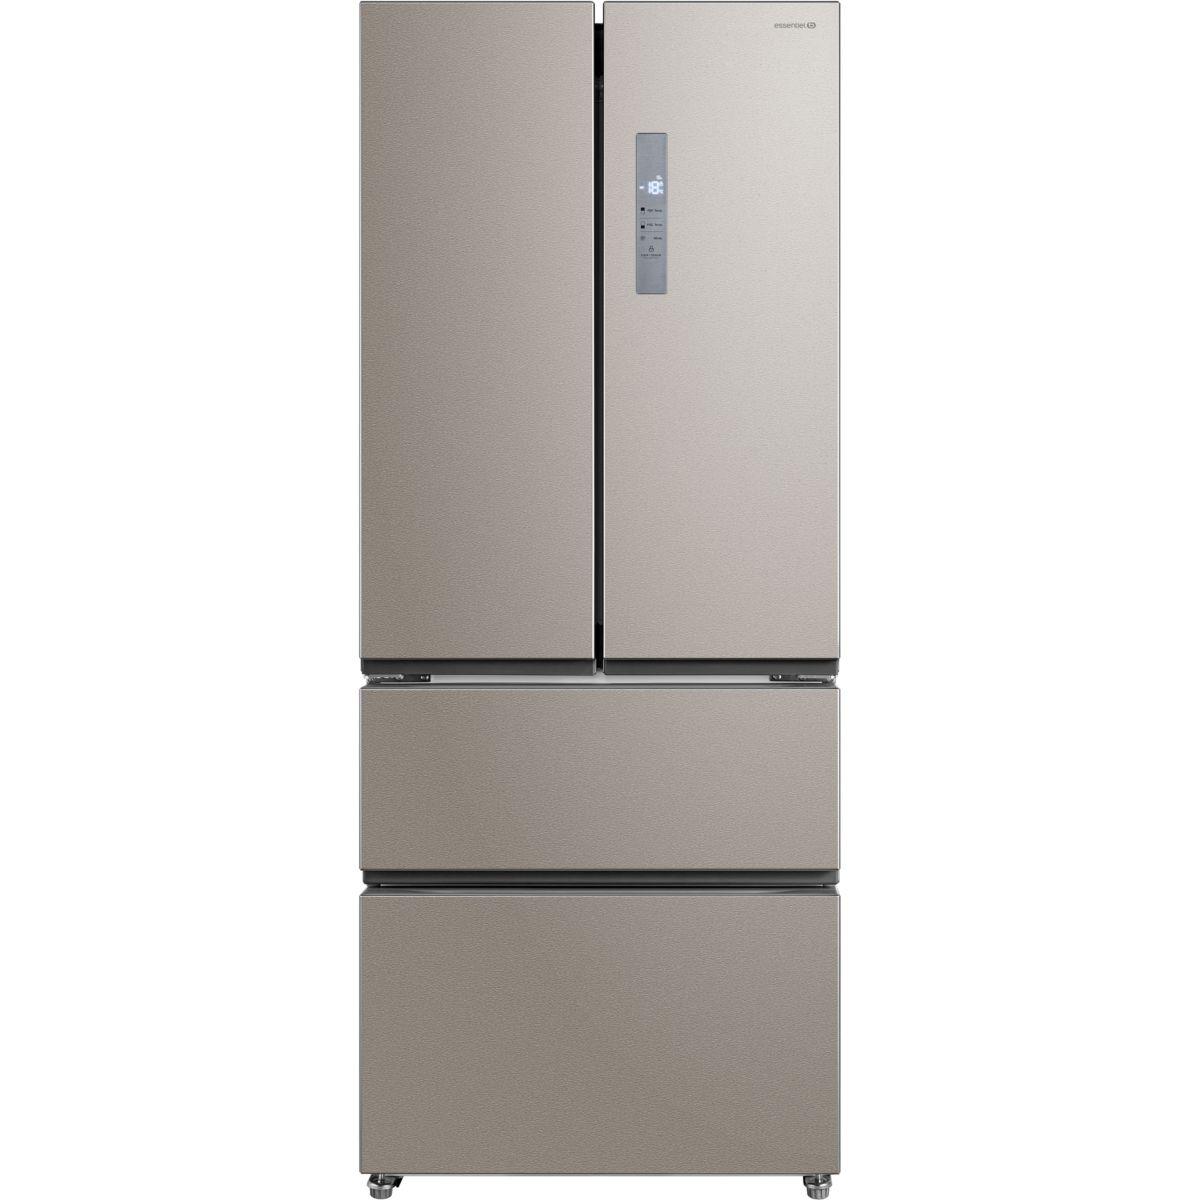 Réfrigérateur multi portes ESSENTIELB ERMV180-70i1